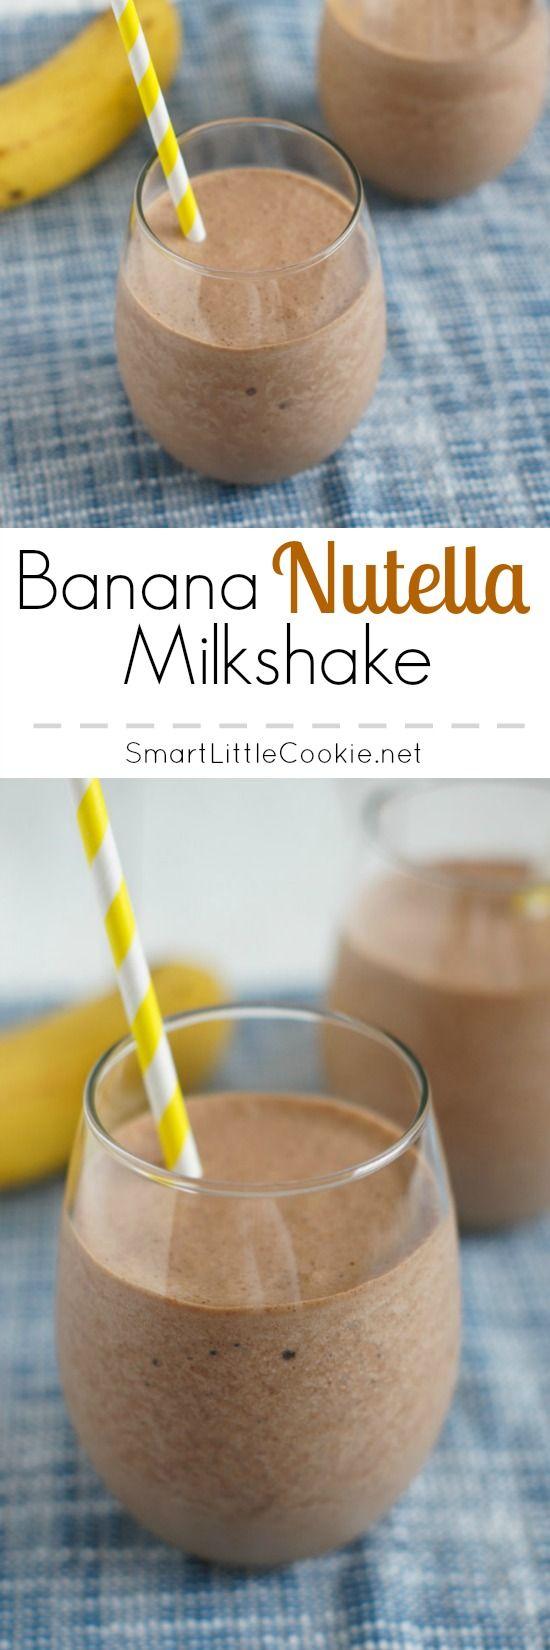 Banana Nutella Milkshake | SmartLittleCookie